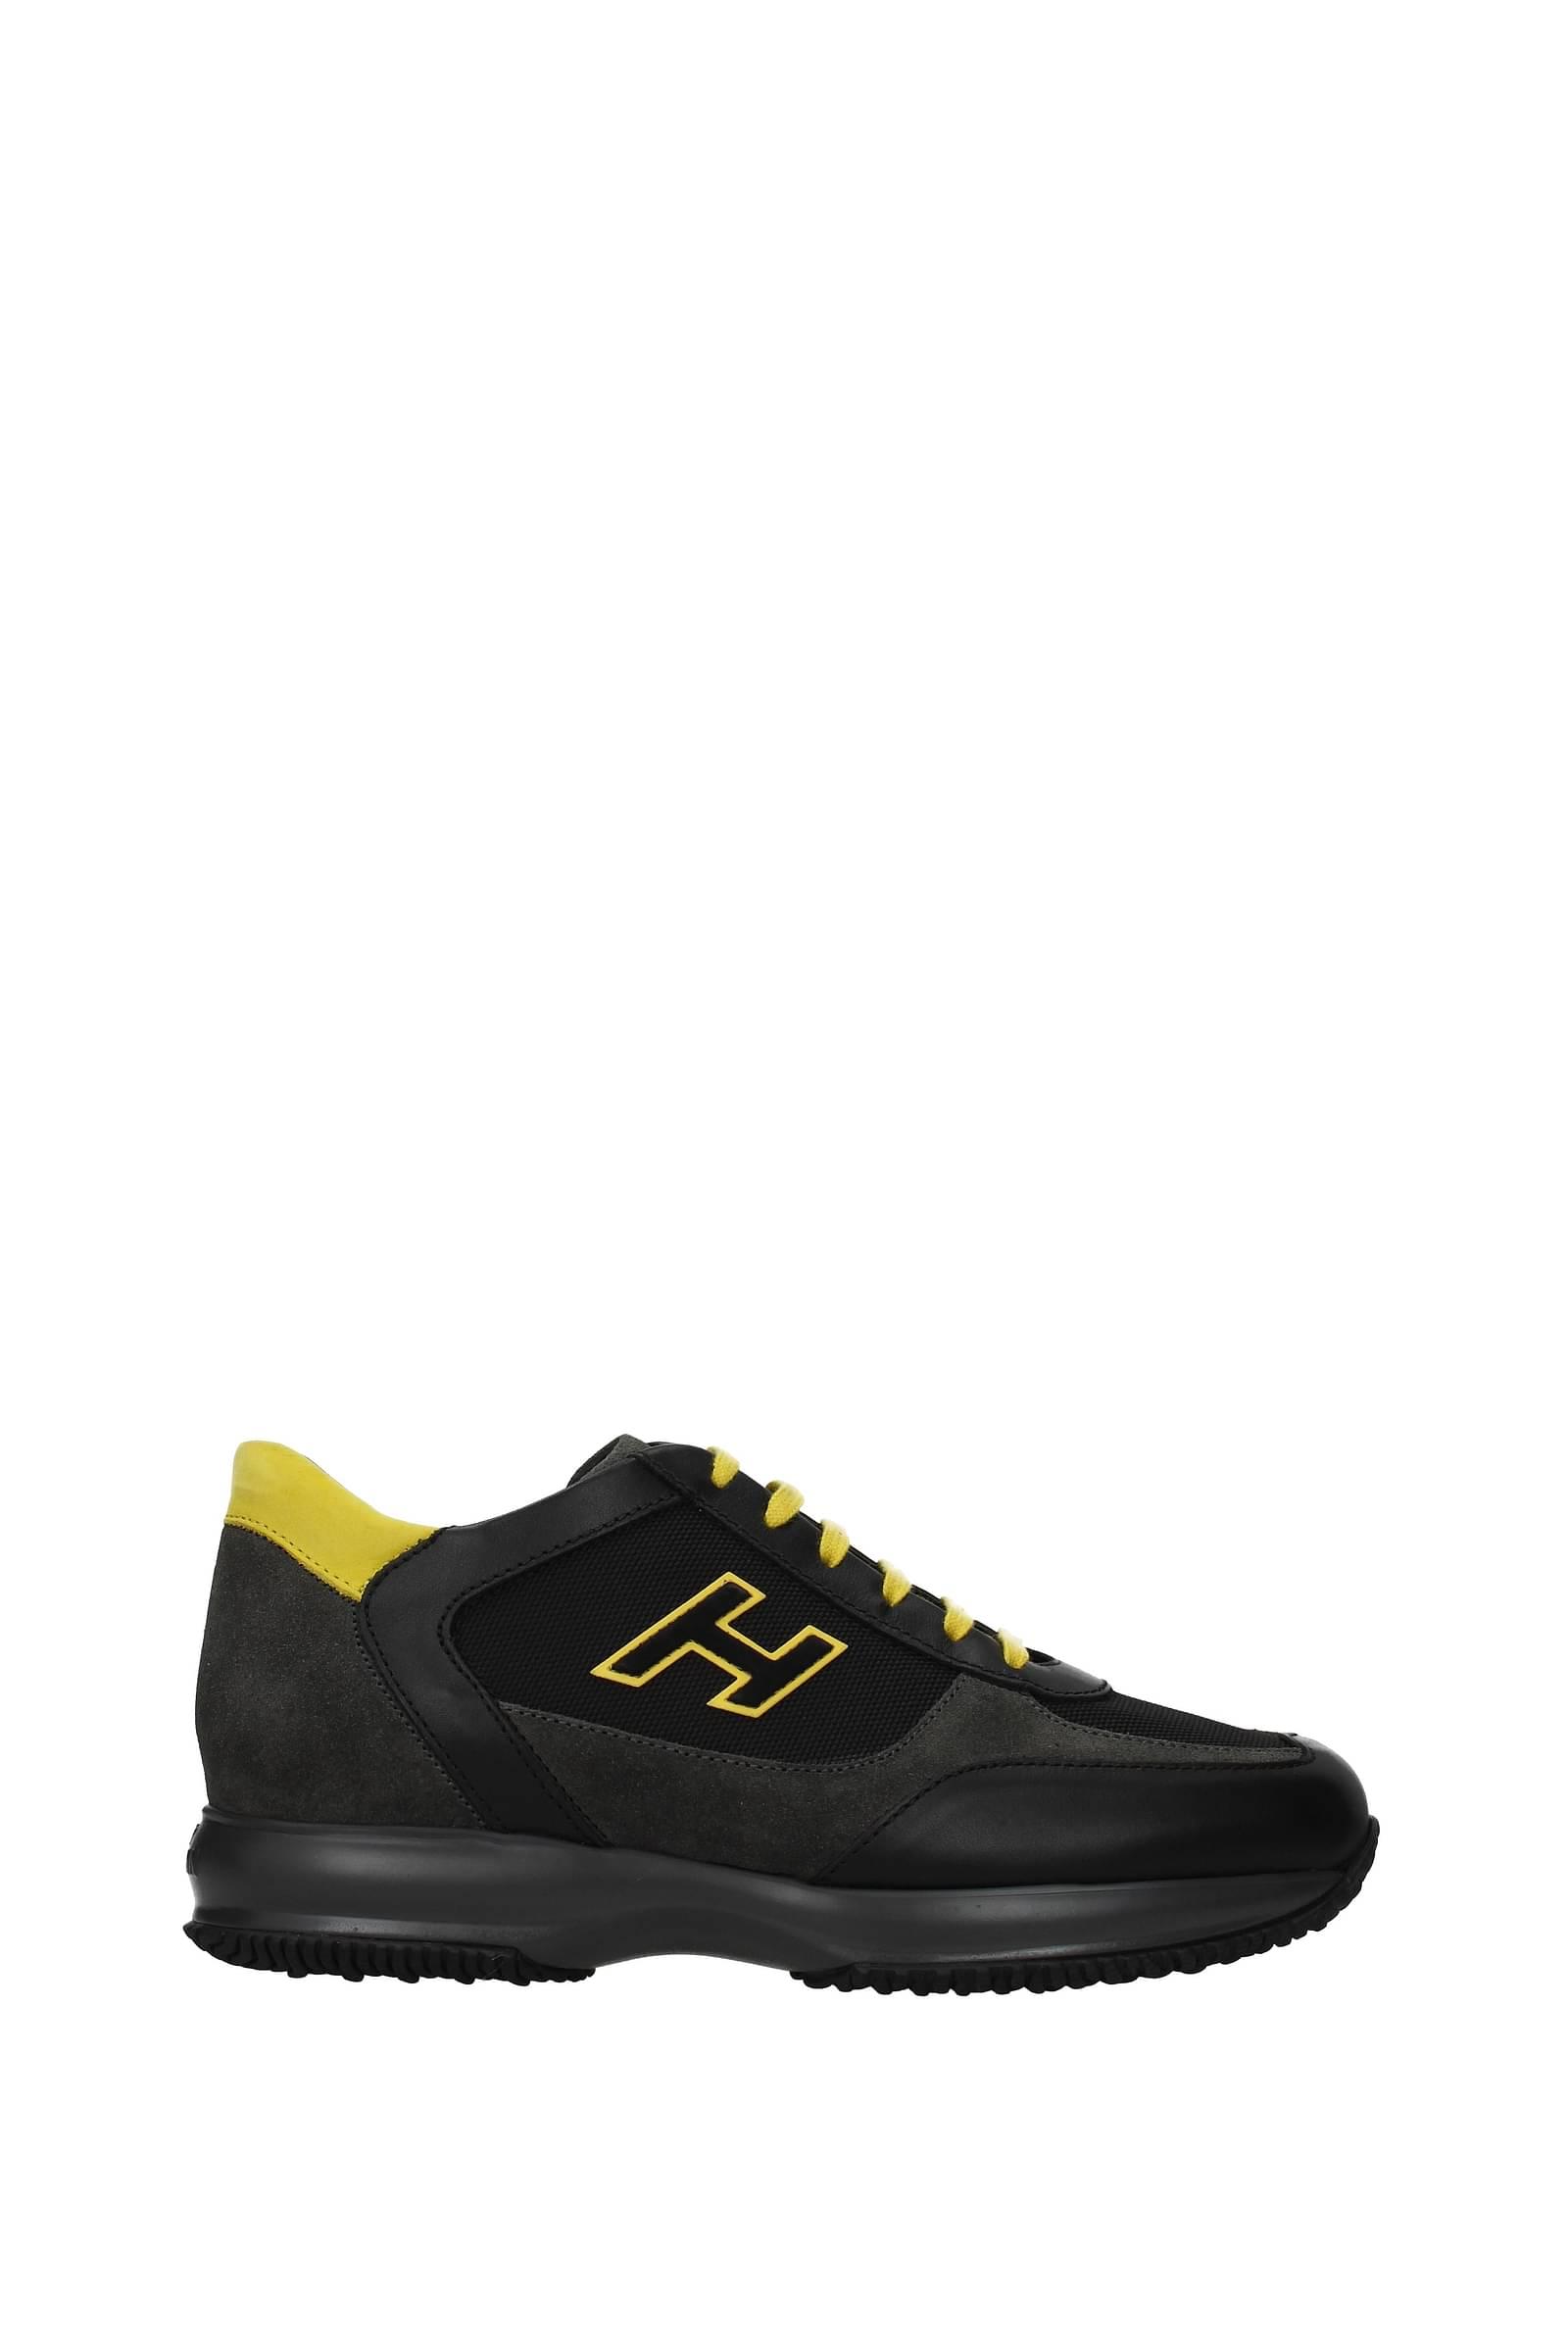 Hogan Sneakers interactive Men HXM00N0Q101O8M50BJ Leather 156,8€